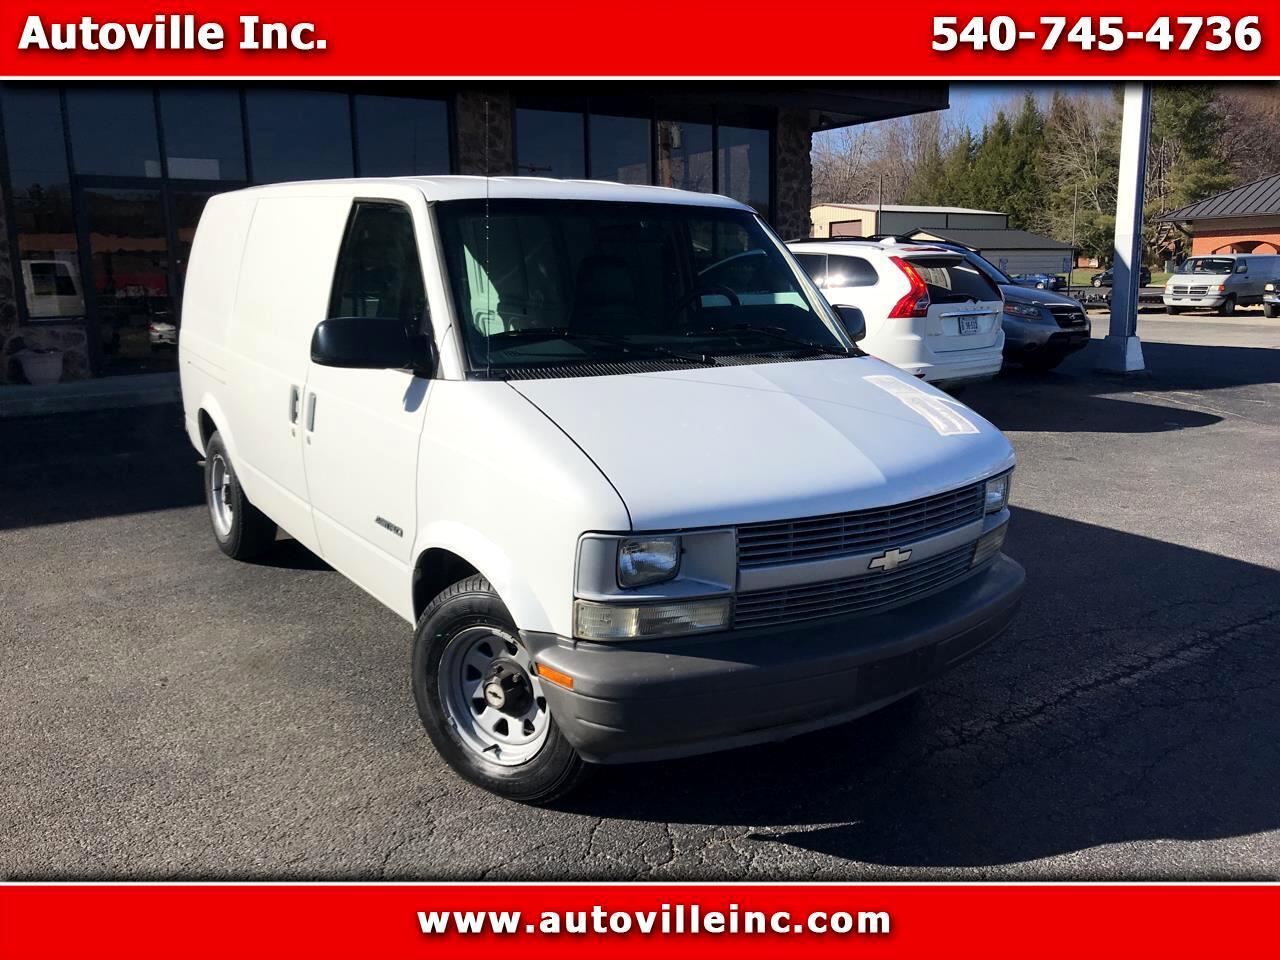 1995 Chevrolet Astro  for sale VIN: 1GCDM19W4SB147626